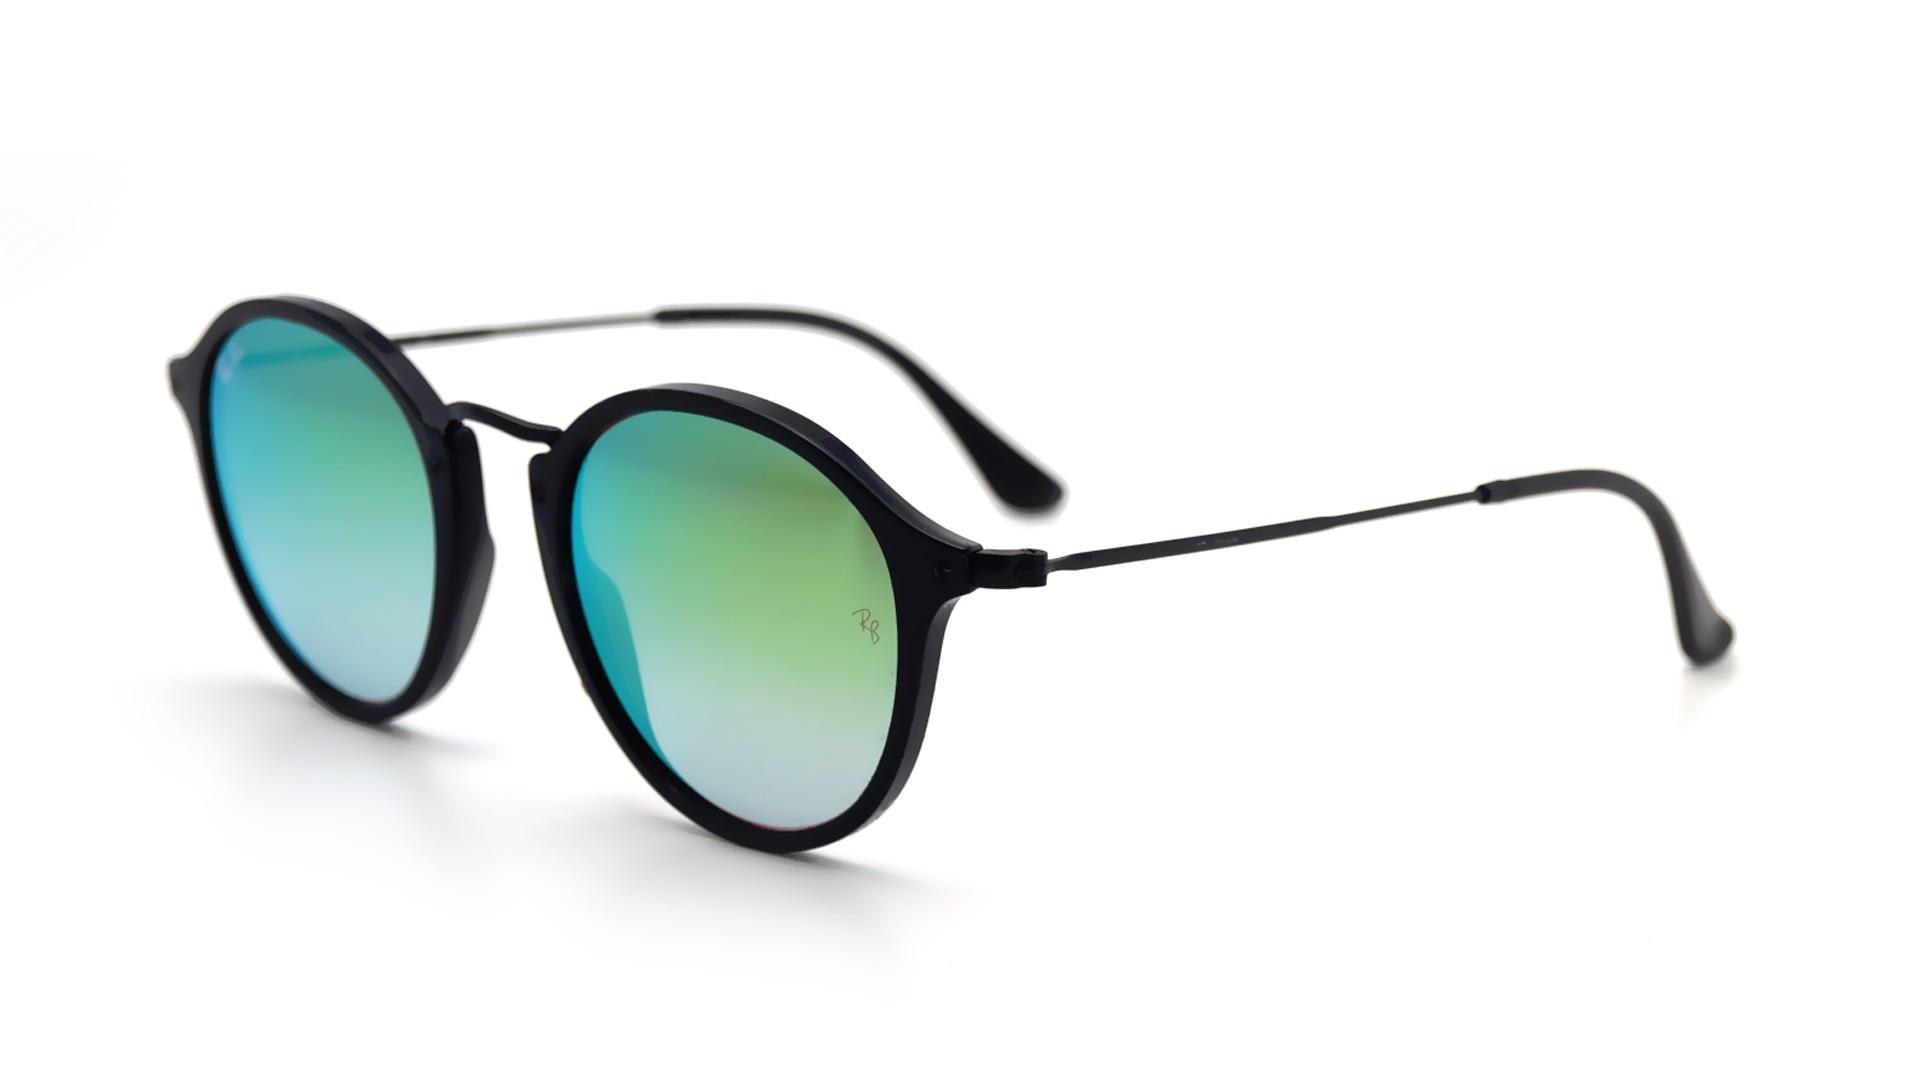 Ray ban sunglasses gradient - Ray Ban Round Fleck Black Rb2447 901 4j 49 21 Visiofactory